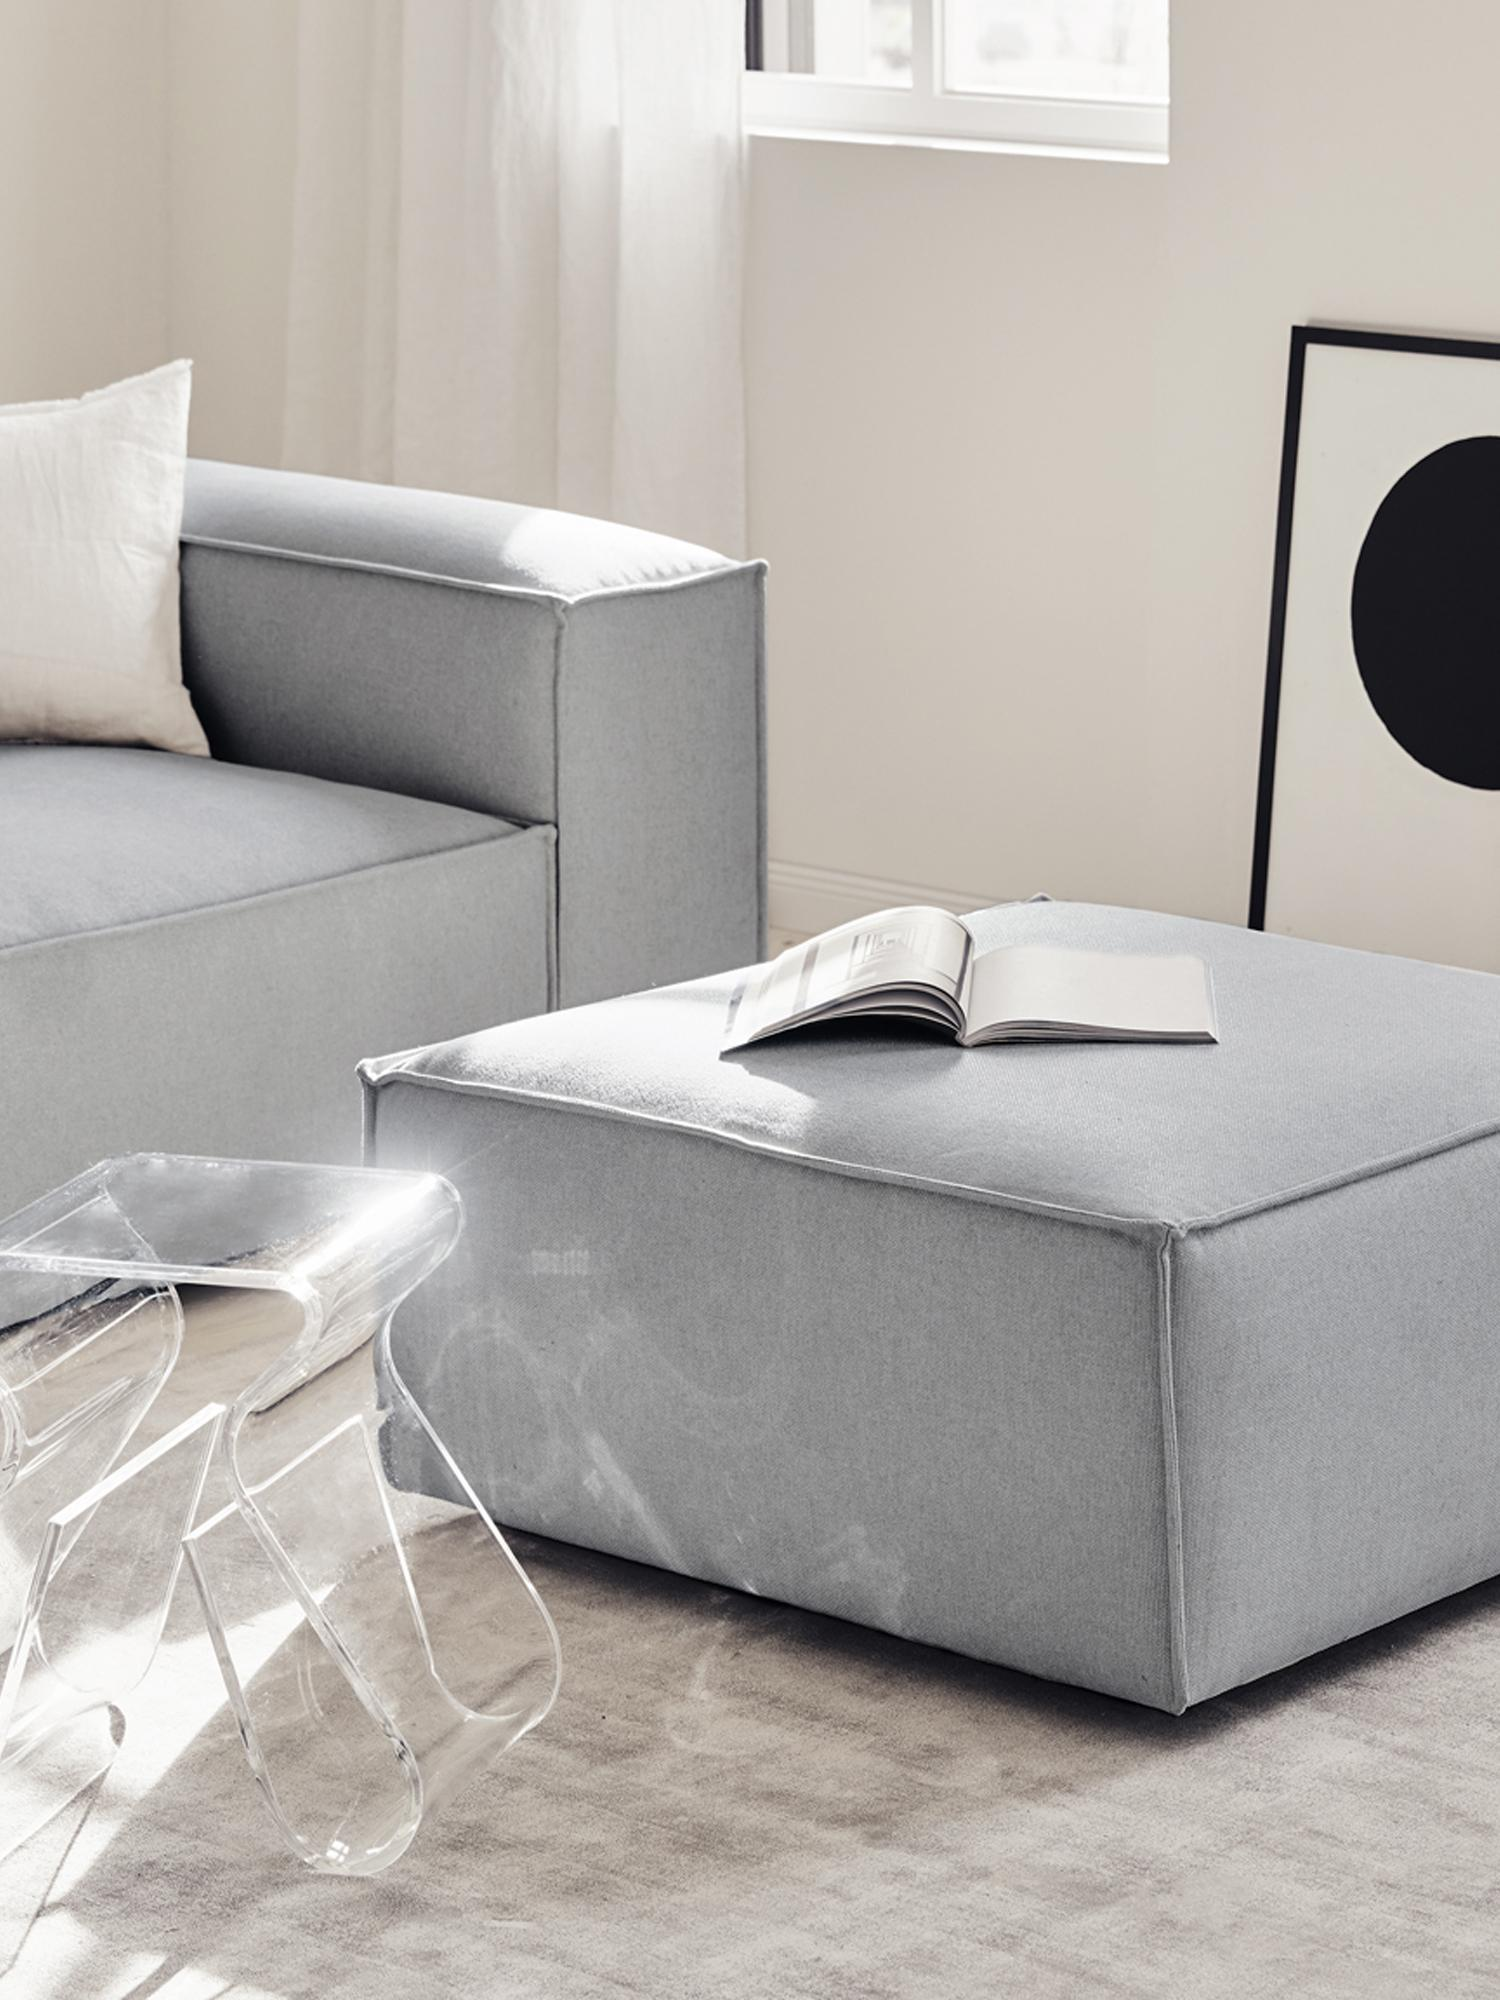 Sofa-Hocker Lennon, Bezug: Polyester 35.000 Scheuert, Gestell: Massives Kiefernholz, Spe, Füße: Kunststoff, Webstoff Hellgrau, 88 x 43 cm